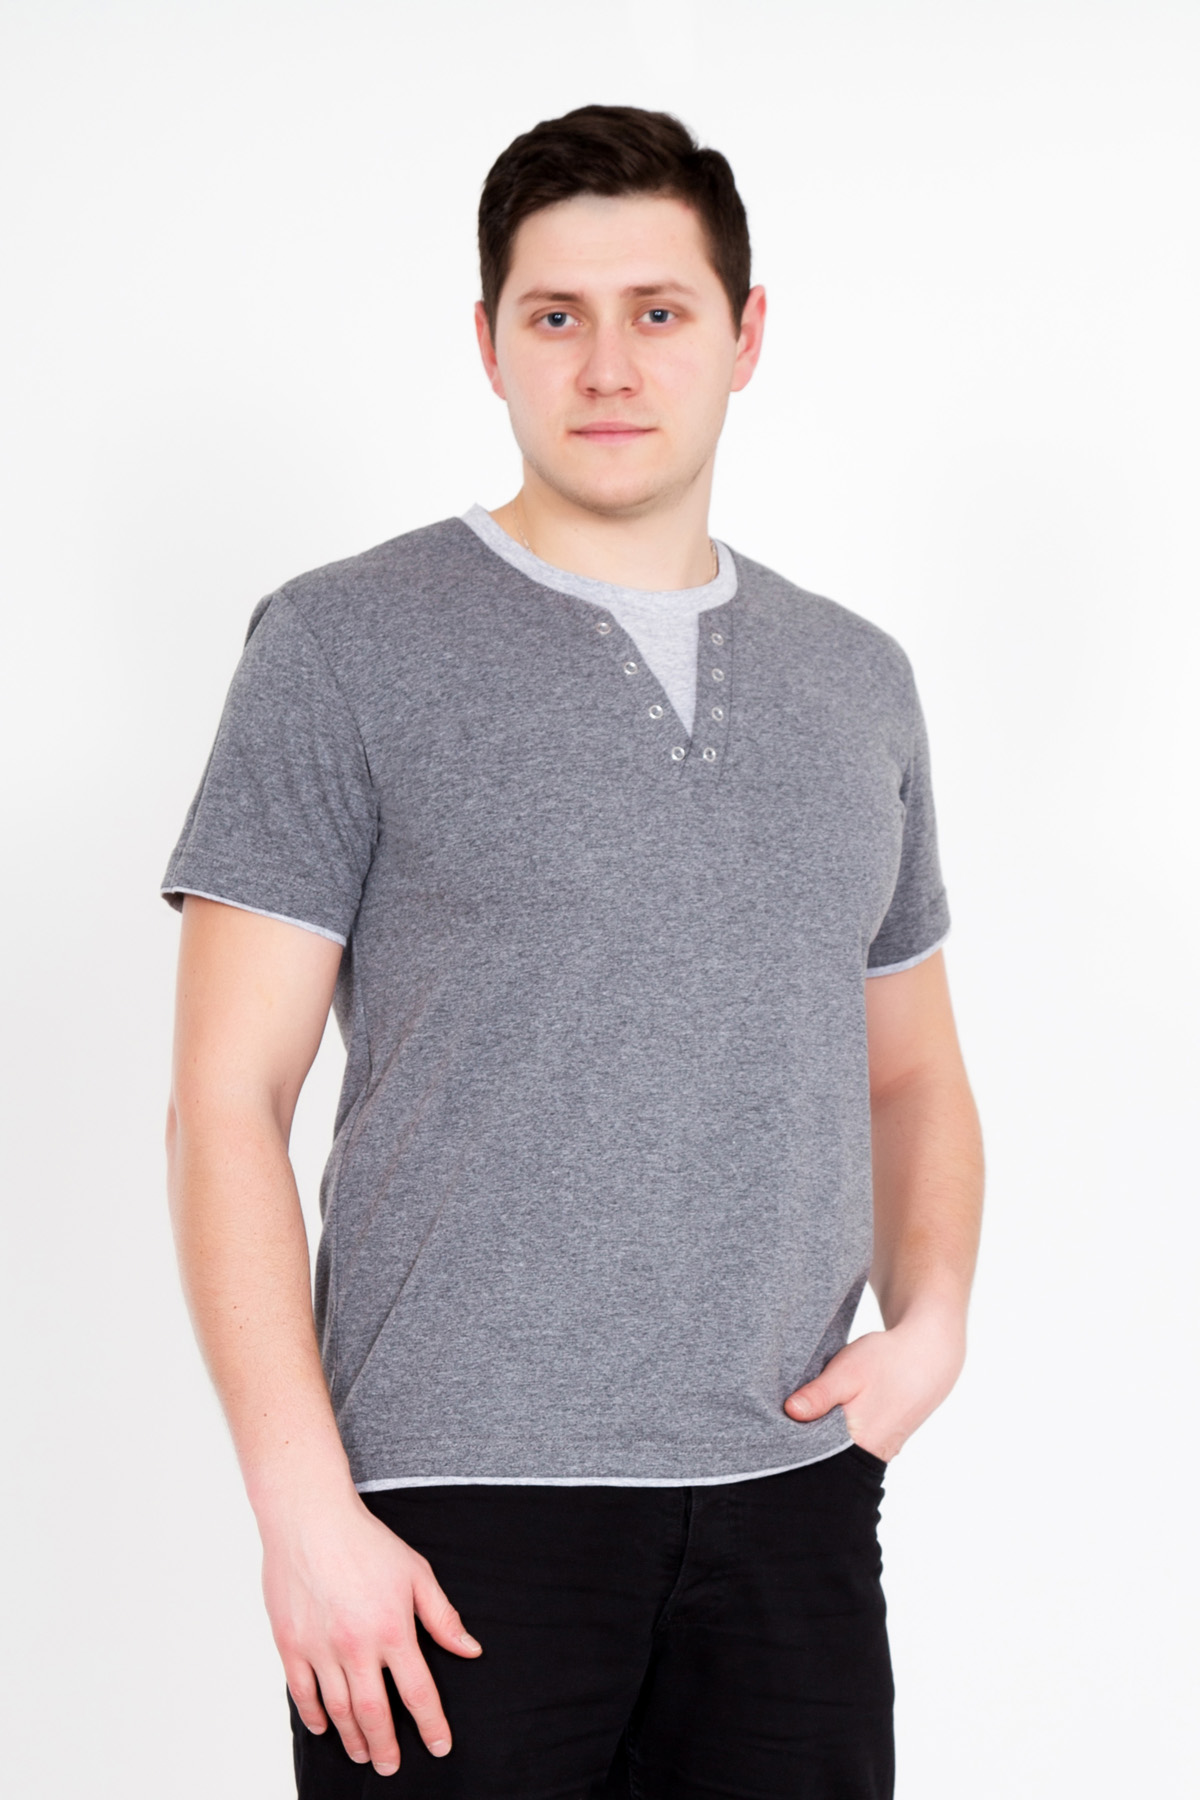 Муж. футболка Джон Серый р. 52Футболки и майки<br>Обхват груди:104 см<br>Обхват талии:96 см<br>Обхват бедер:108 см<br>Длина по спинке:70 см<br>Рост:176-182 см<br><br>Тип: Муж. футболка<br>Размер: 52<br>Материал: Кулирка